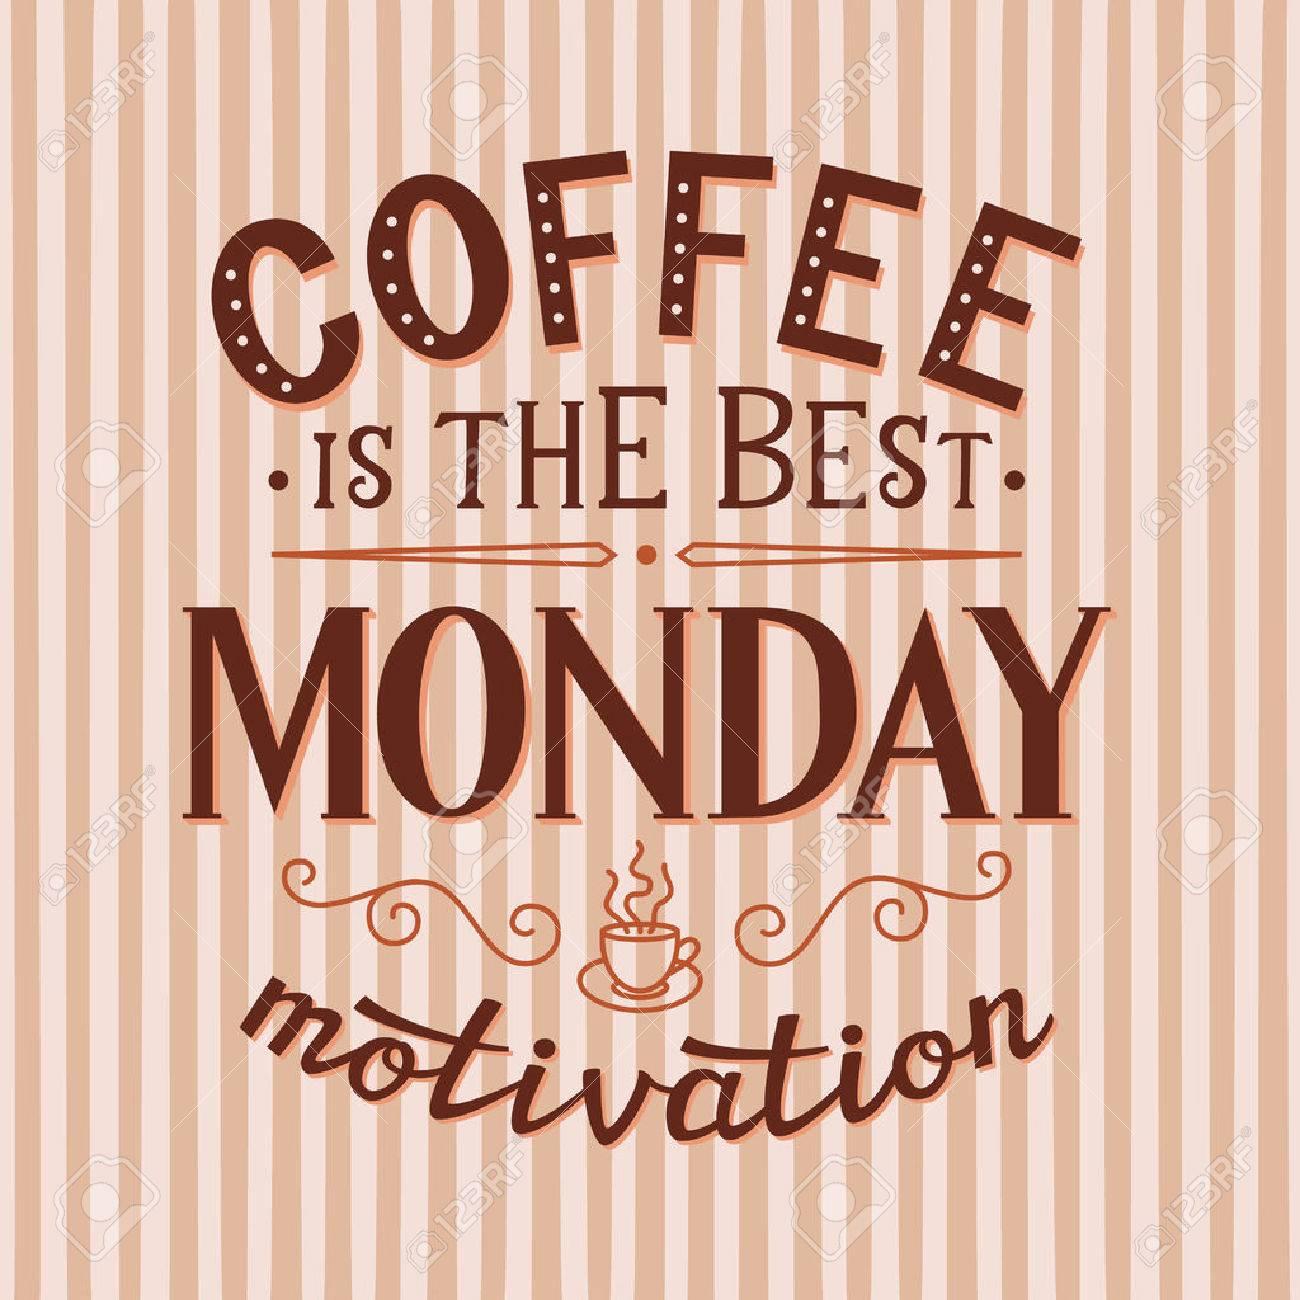 Kaffee Ist Das Beste Montag Motivation. Original-Motivzitat ...